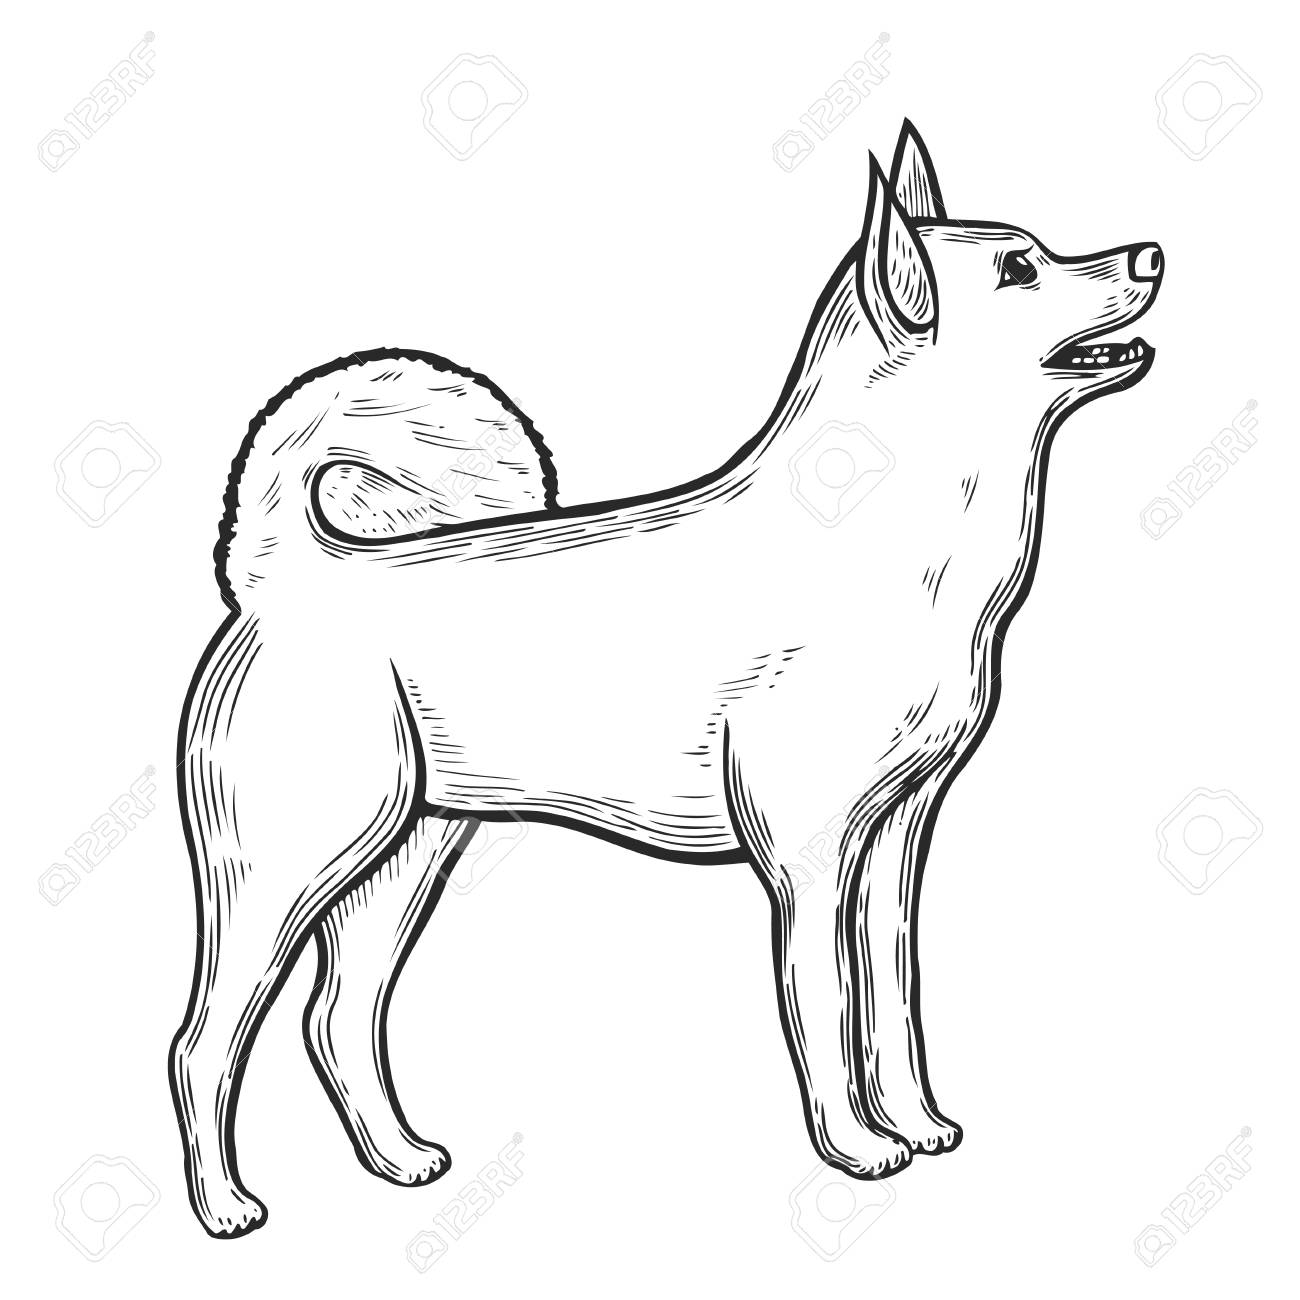 Vector Hand Drawn Illustration With Siberian Husky Eskimo Dog